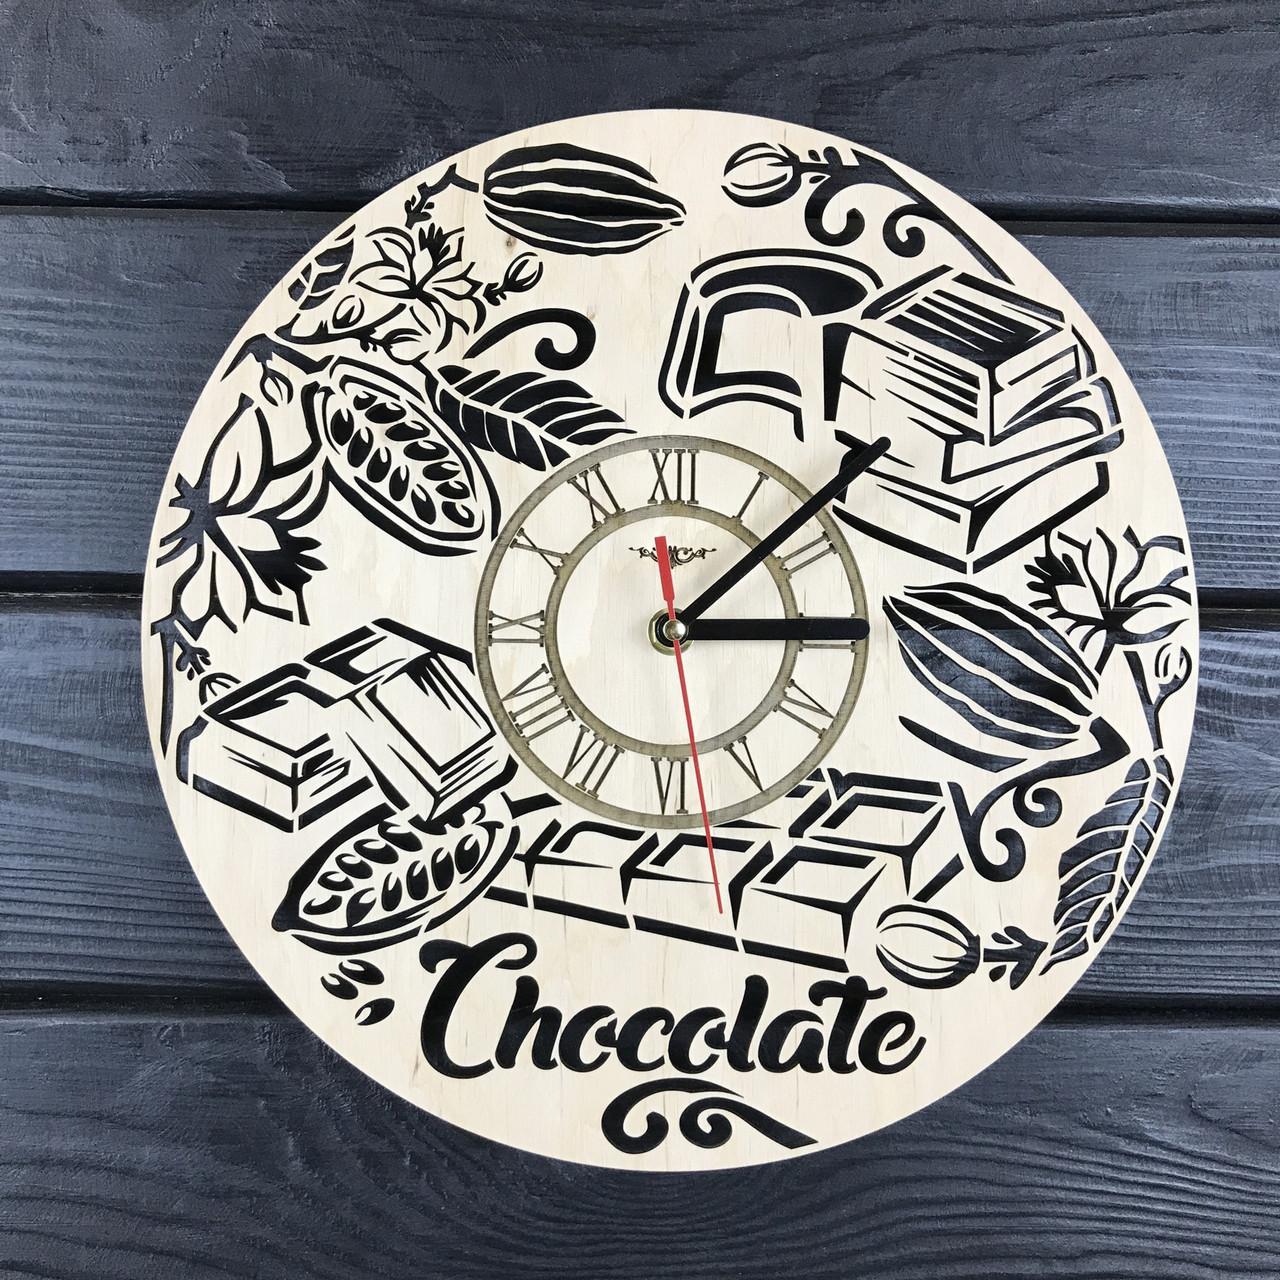 Концептуальные настенные часы из дерева «Шоколад»